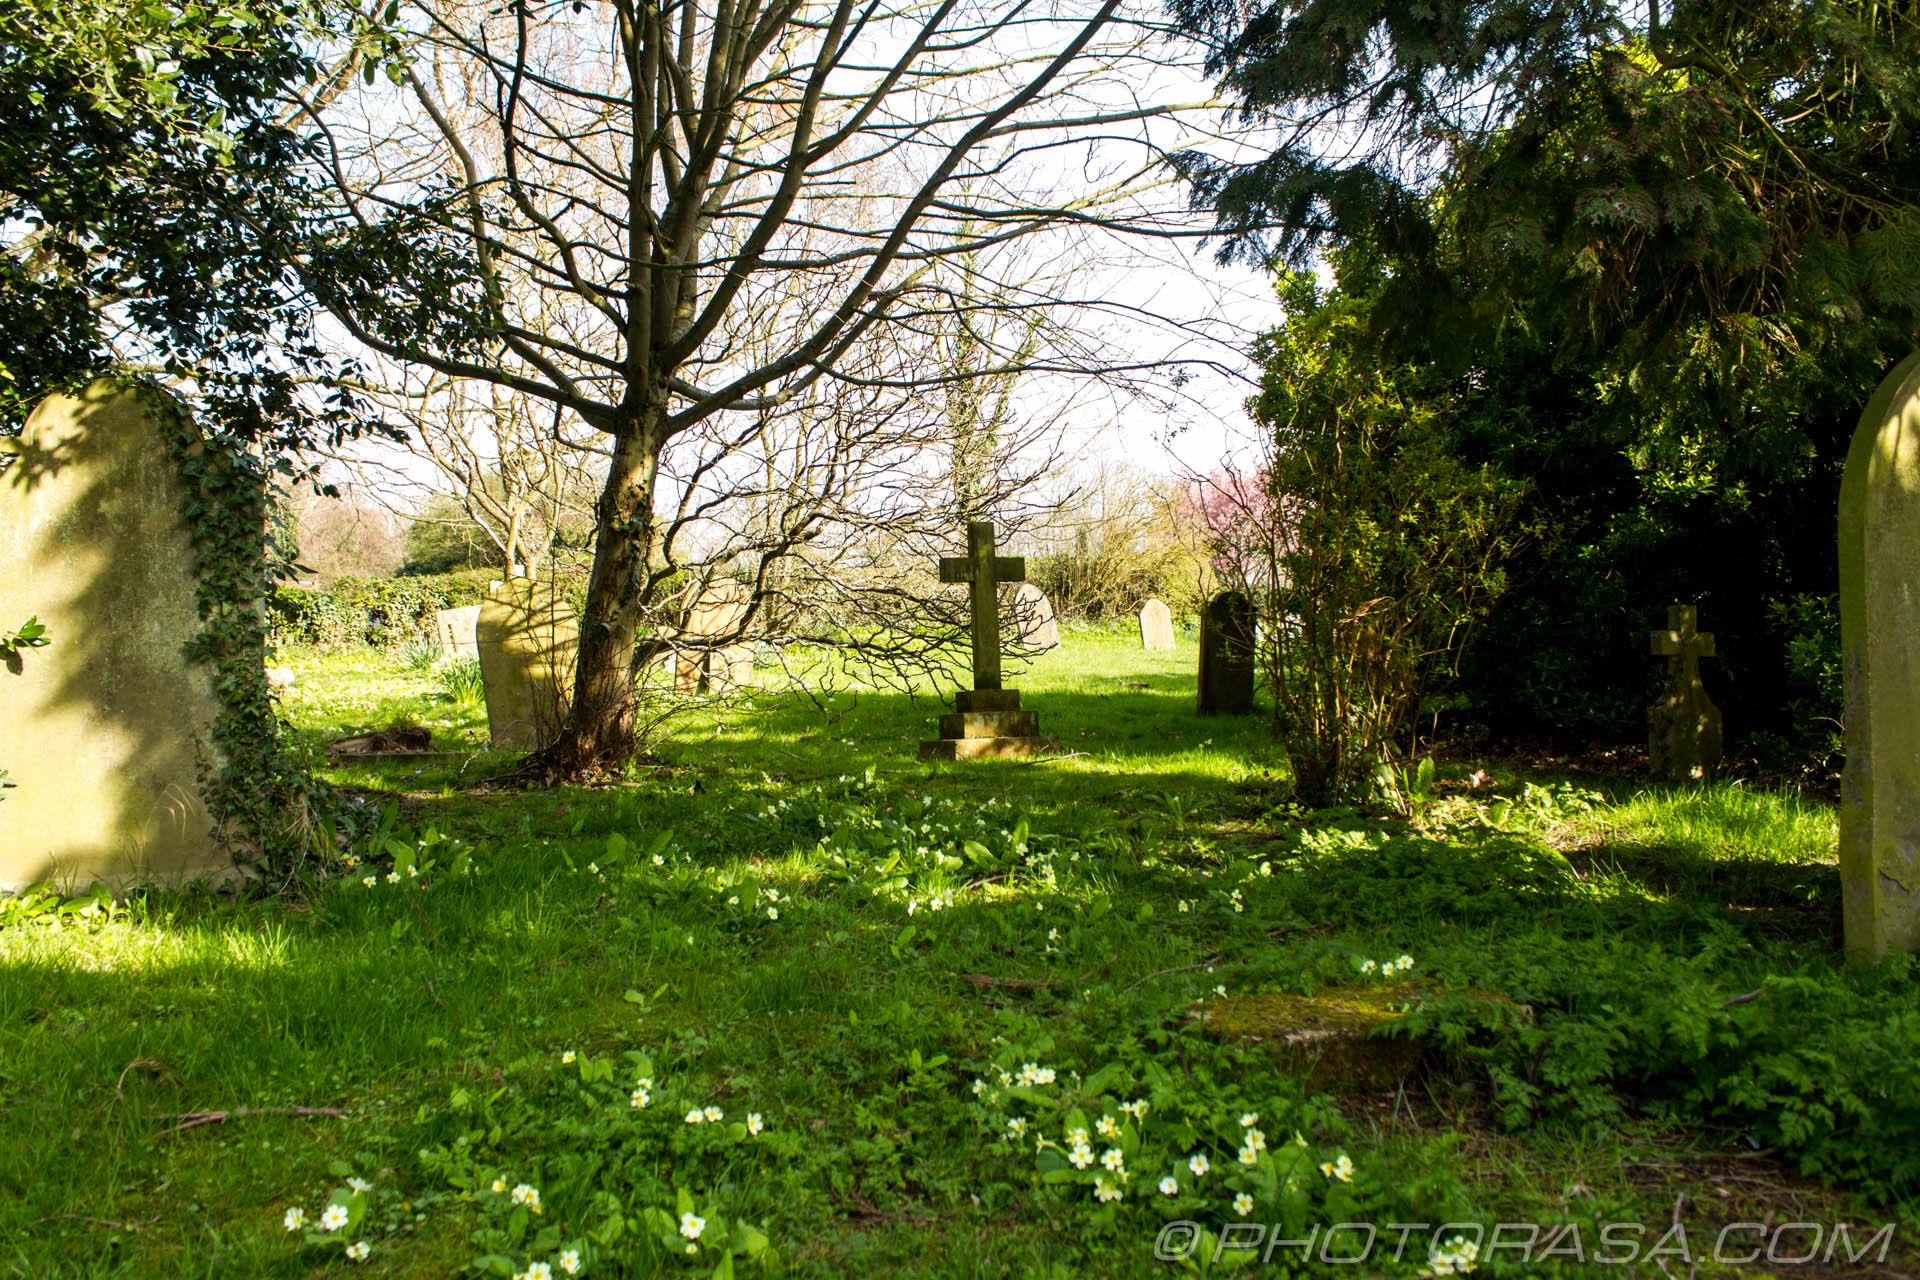 https://photorasa.com/saints-church-staplehurst-kent/stone-cross-in-cemetery-clearing/